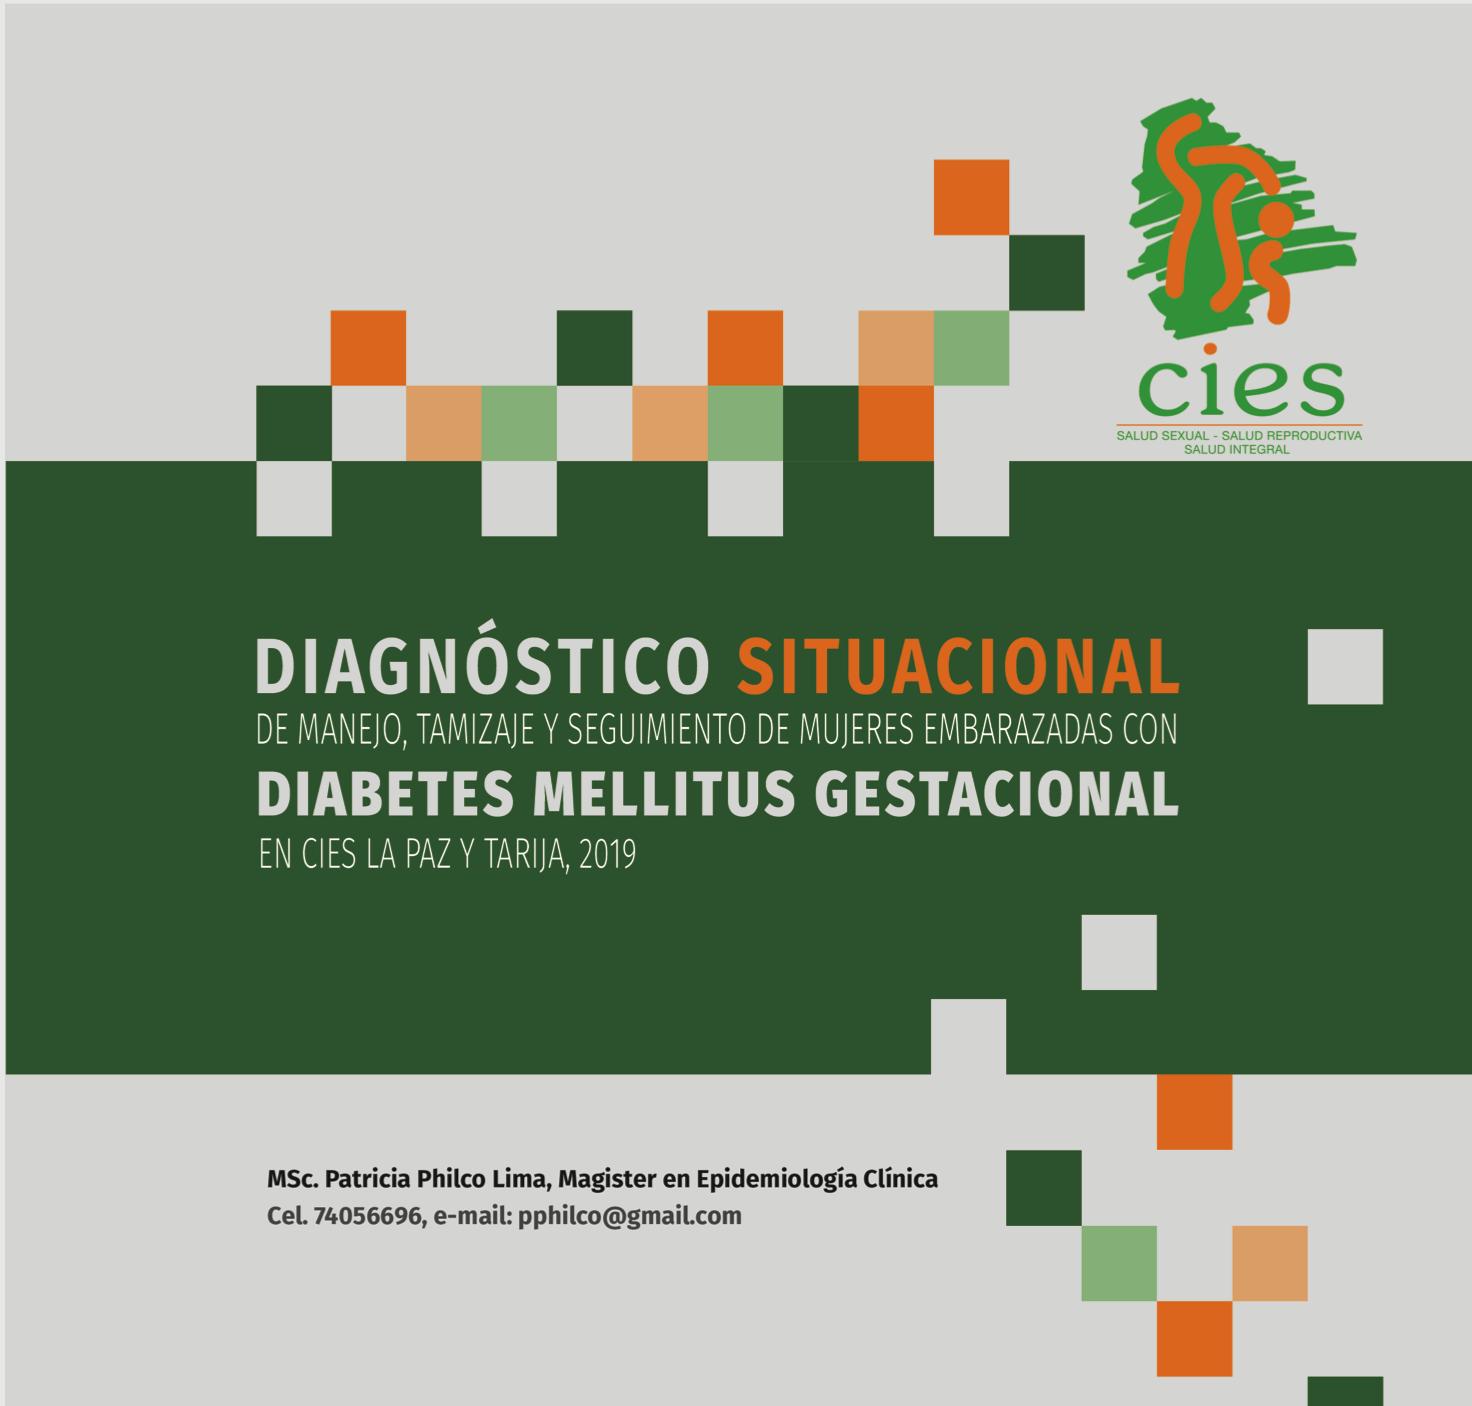 Diagnóstico Situacional Diabetes Mellitus Gestacional